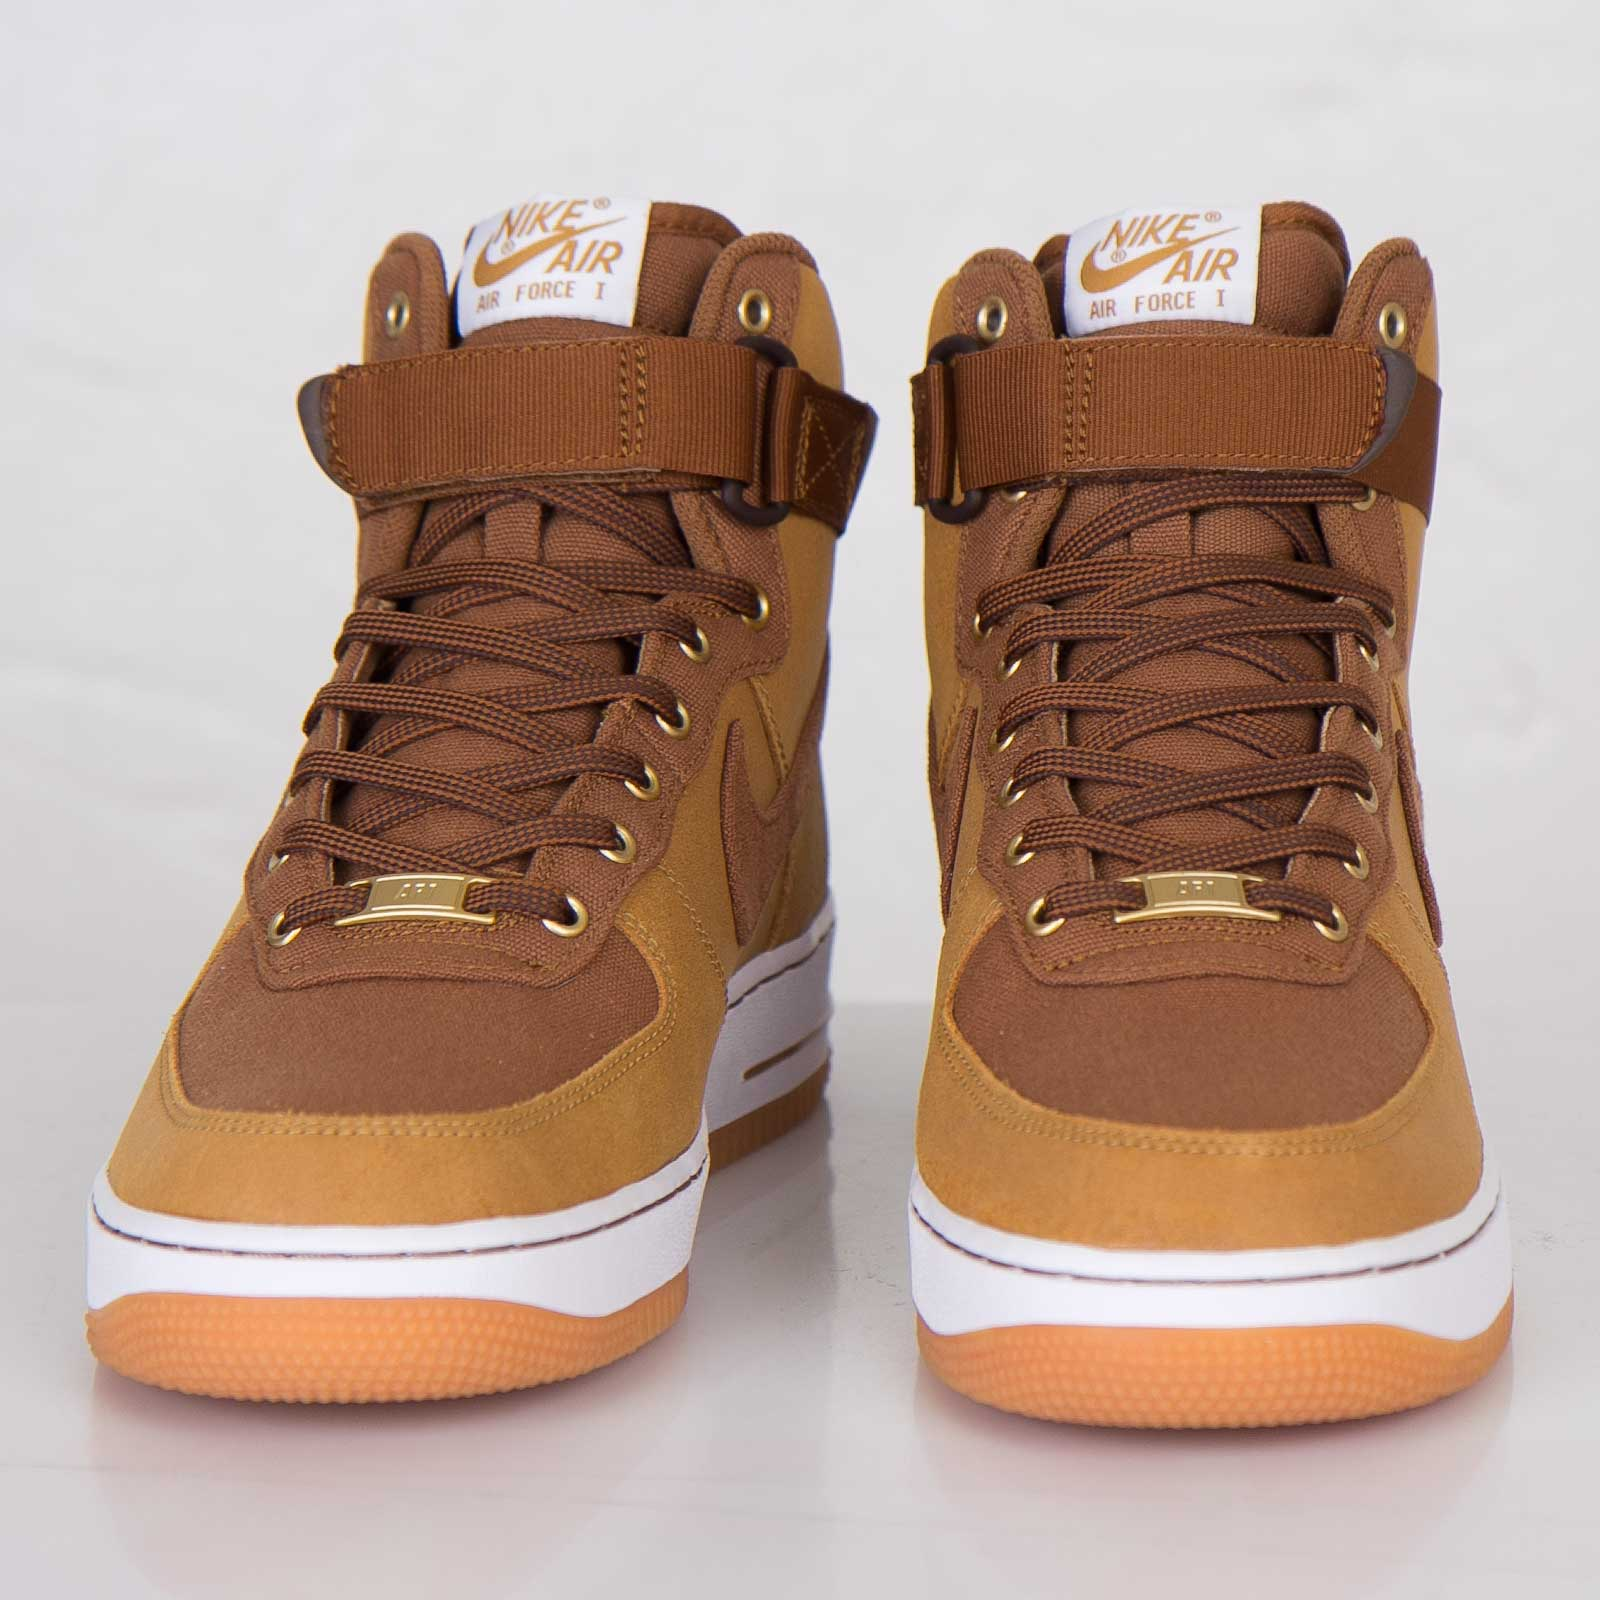 Nike Air Force 1 High ´07 WW 631405 200 Sneakersnstuff